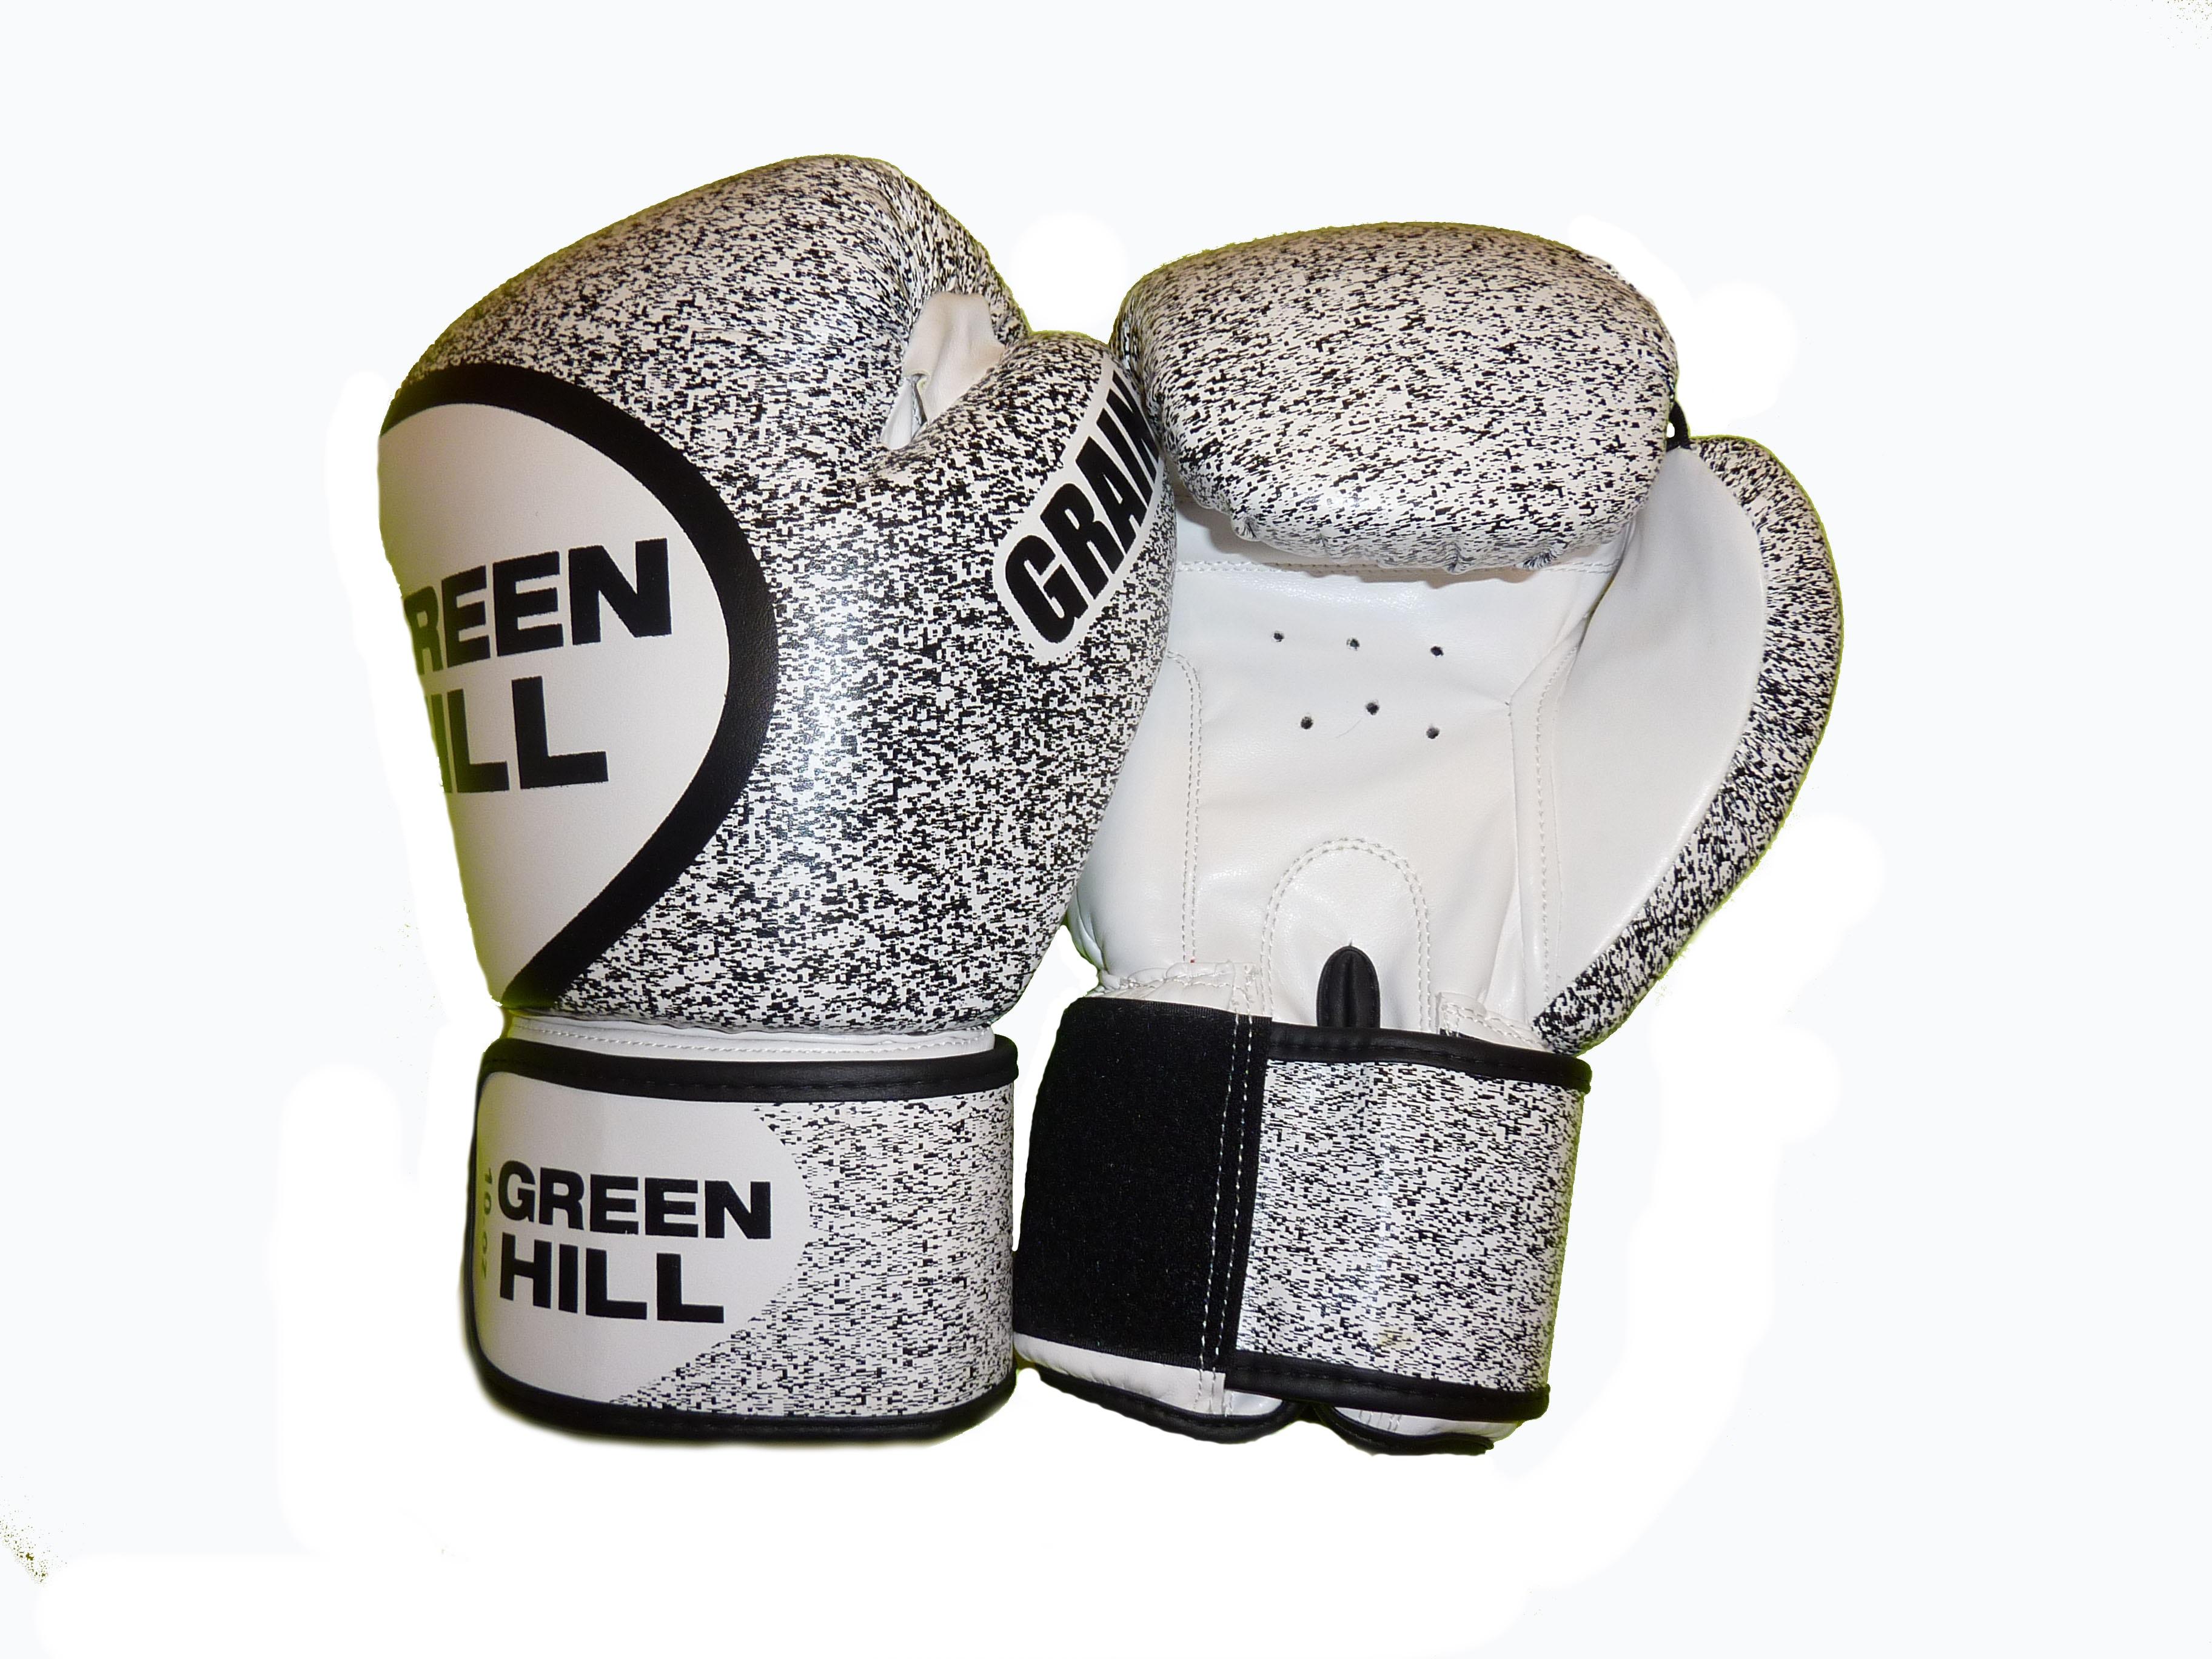 Lot of Green Hill sport equipment_5